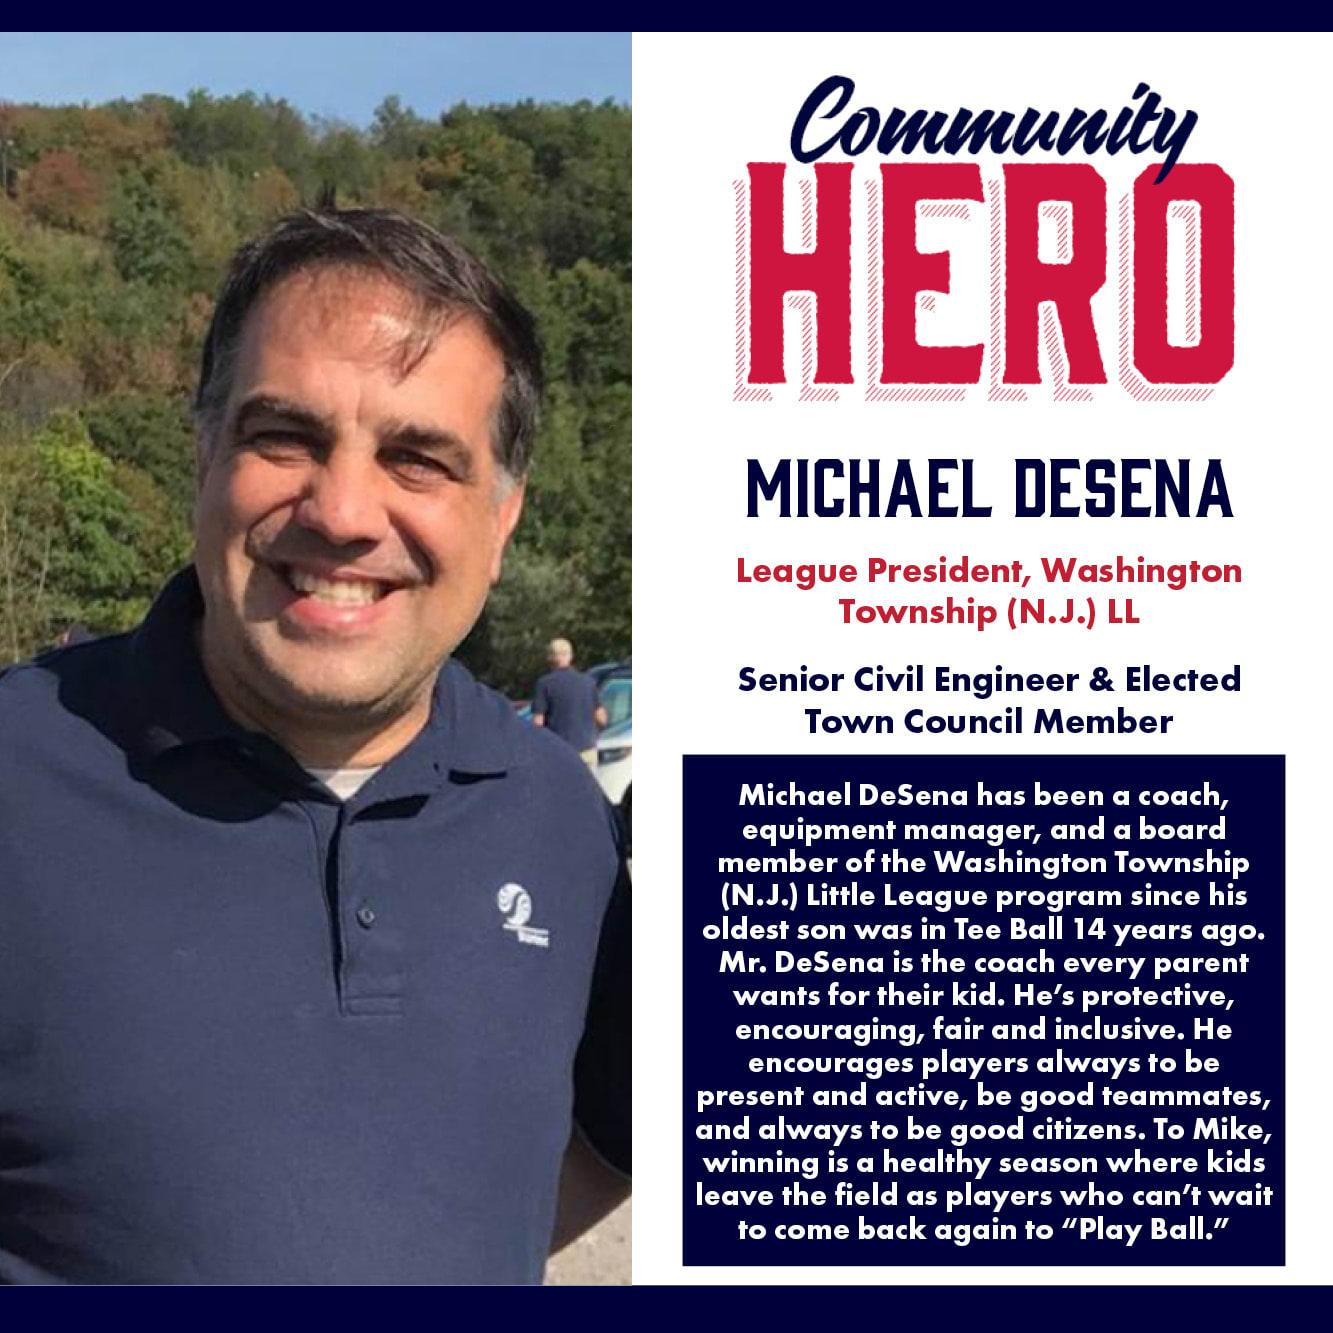 Michael Desena Community Hero